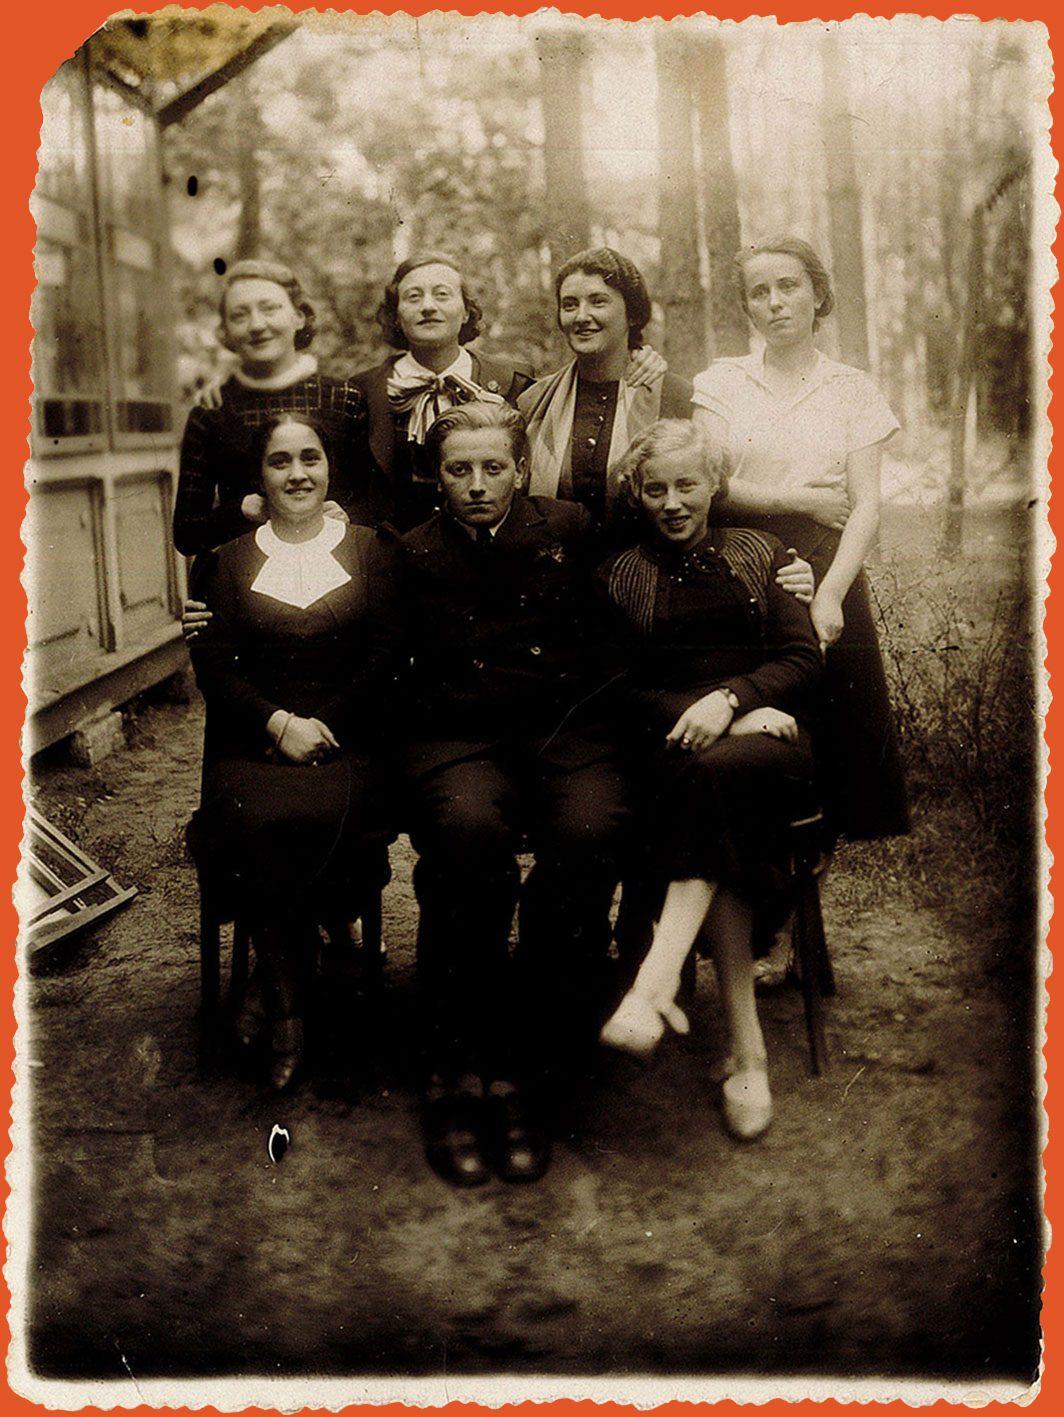 Group portrait taken in the woods